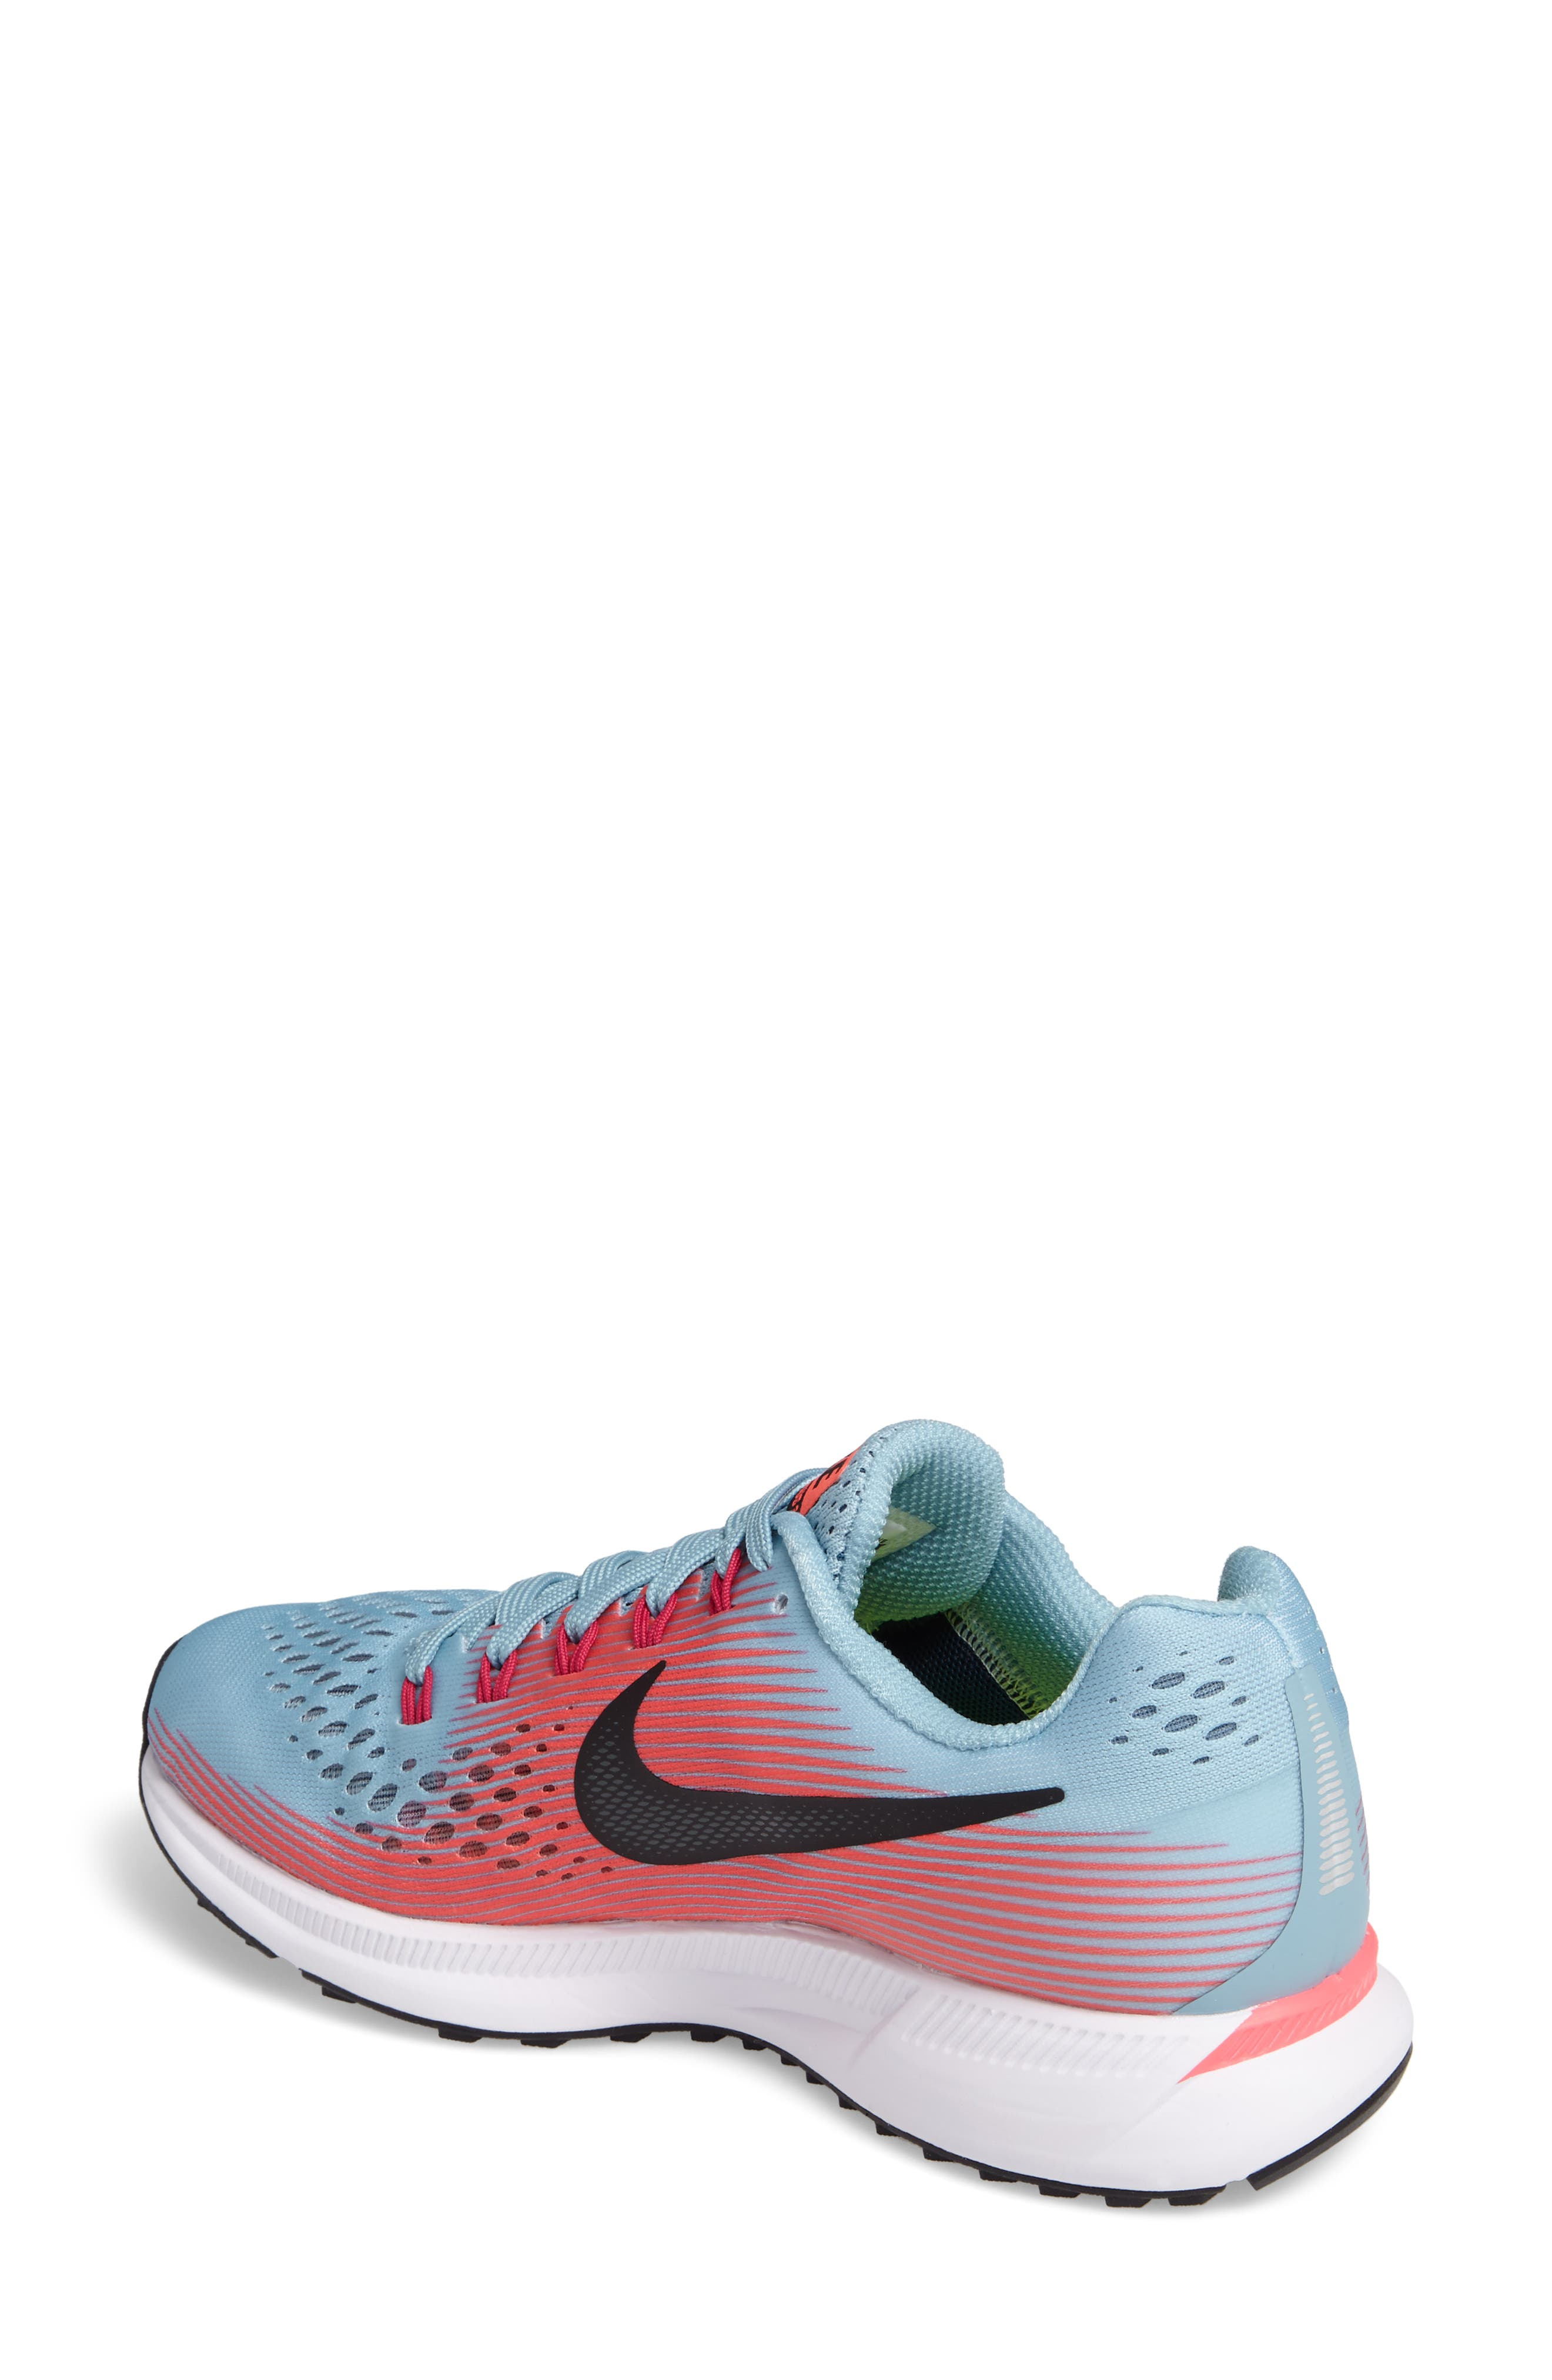 Air Zoom Pegasus 34 Running Shoe,                             Alternate thumbnail 2, color,                             Blue/ White/ Pink/ Fuchsia